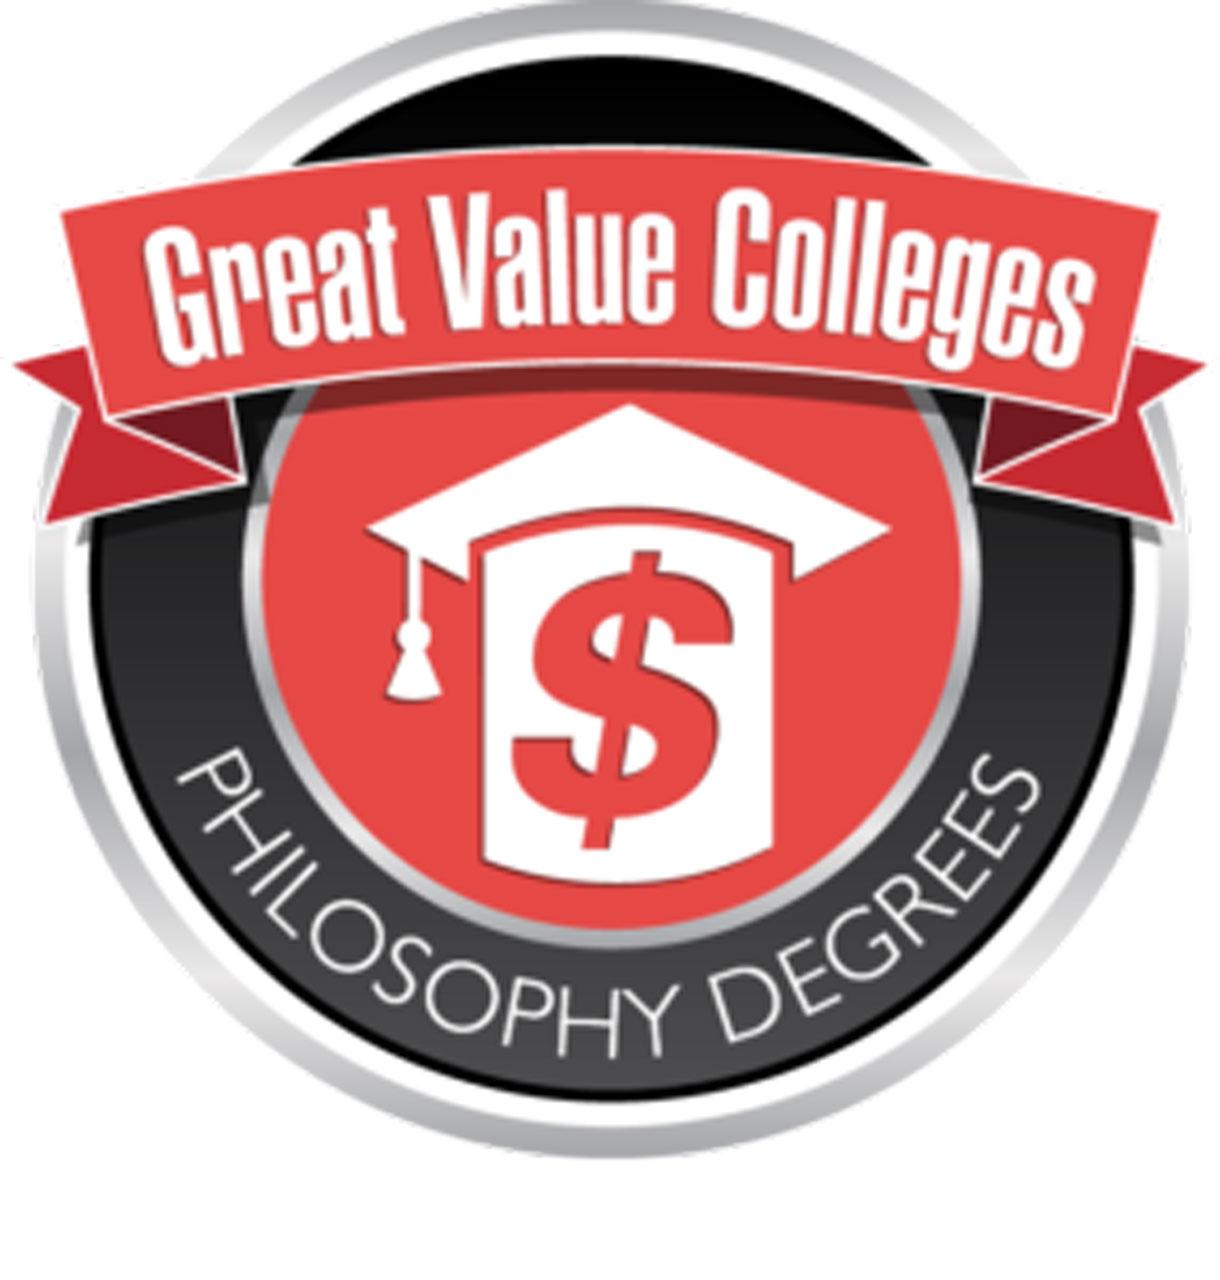 best colleges badge